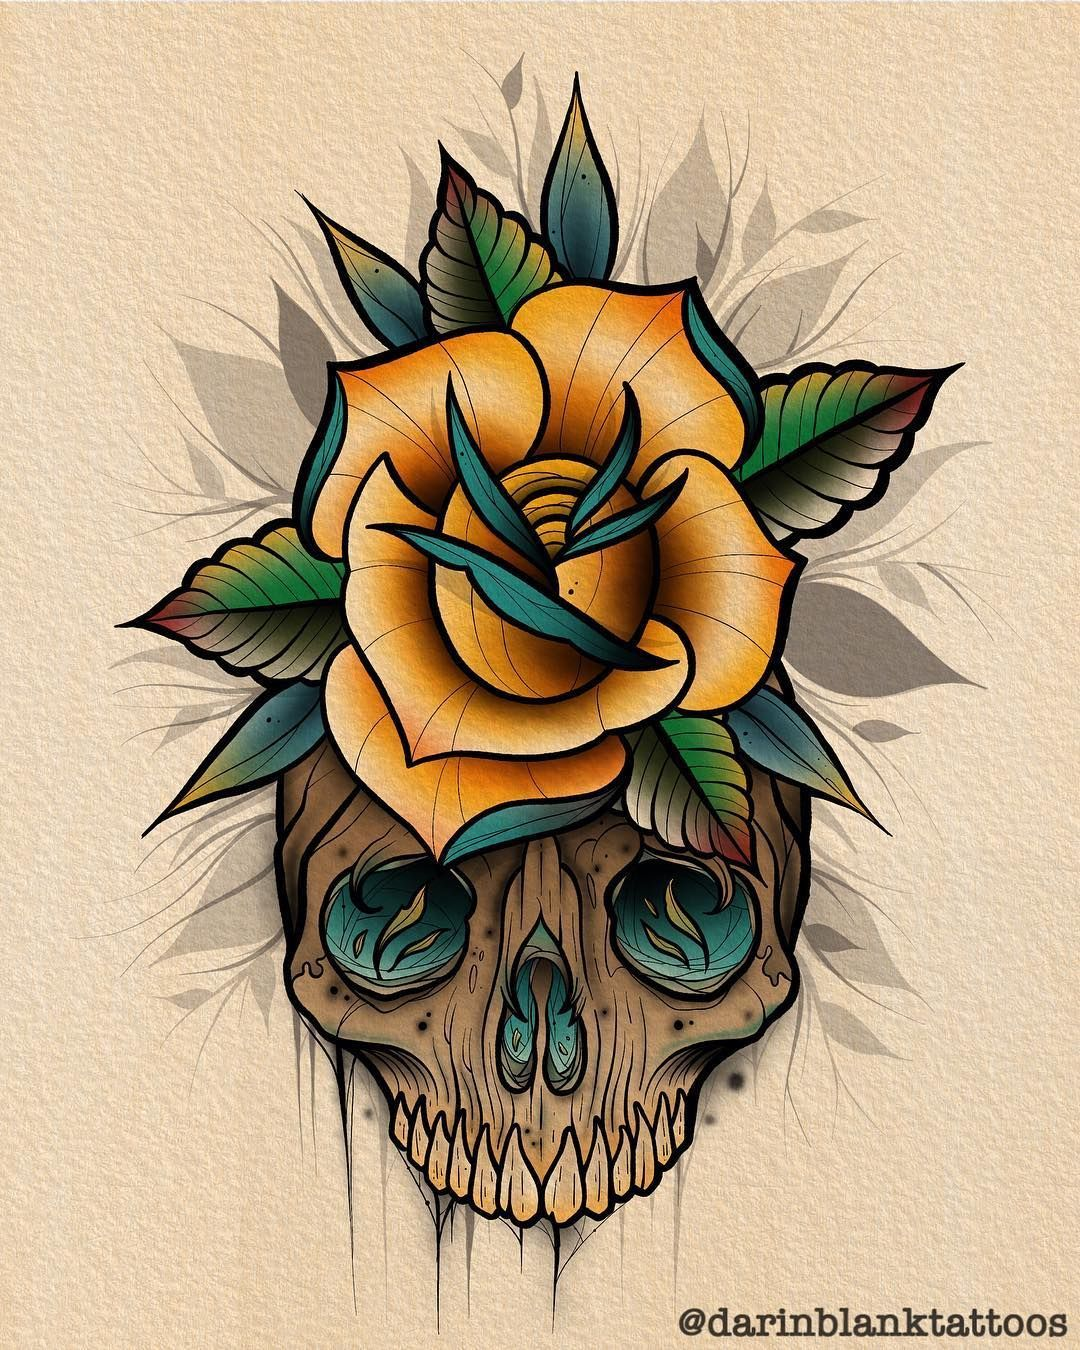 Darin Blank On Instagram Skull And Rose Tattoo Tattoos Tattooart Tattooartist Skull Rose Tattoos Traditional Rose Tattoos Rose Tattoo Design